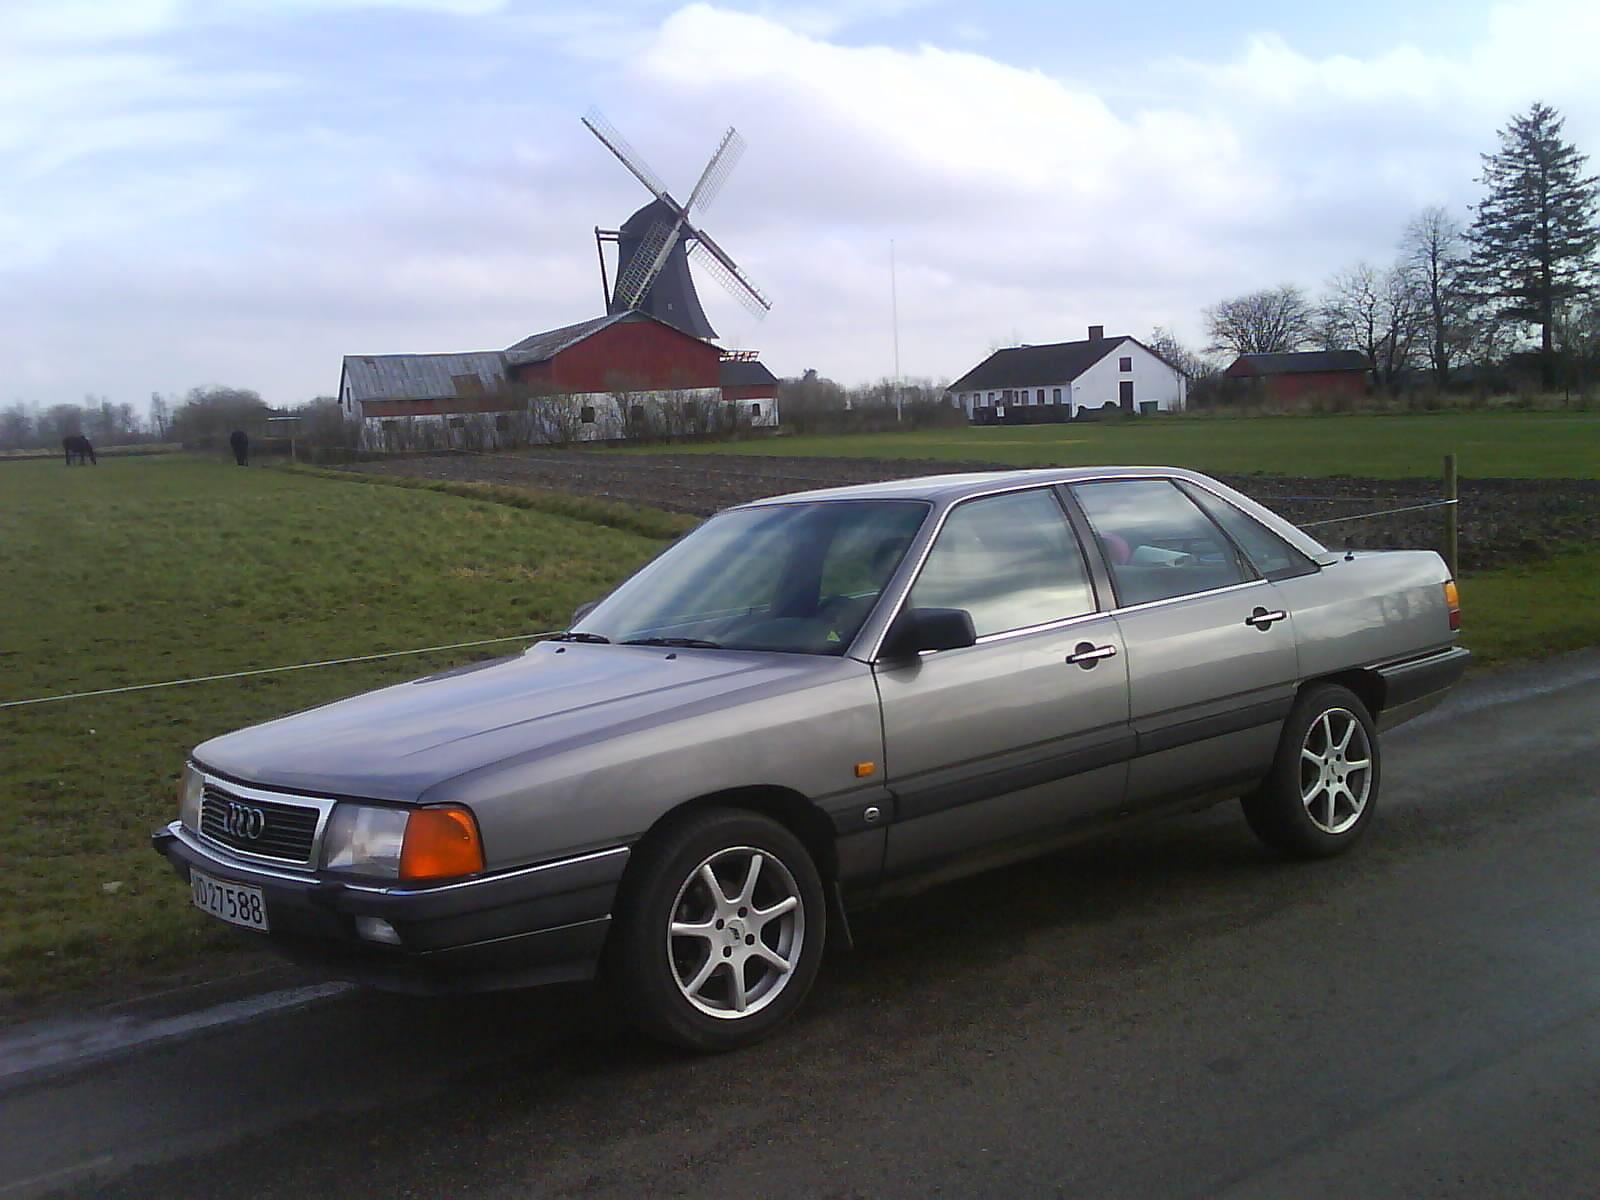 1983 Audi 100 Test Drive Review - CarGurus